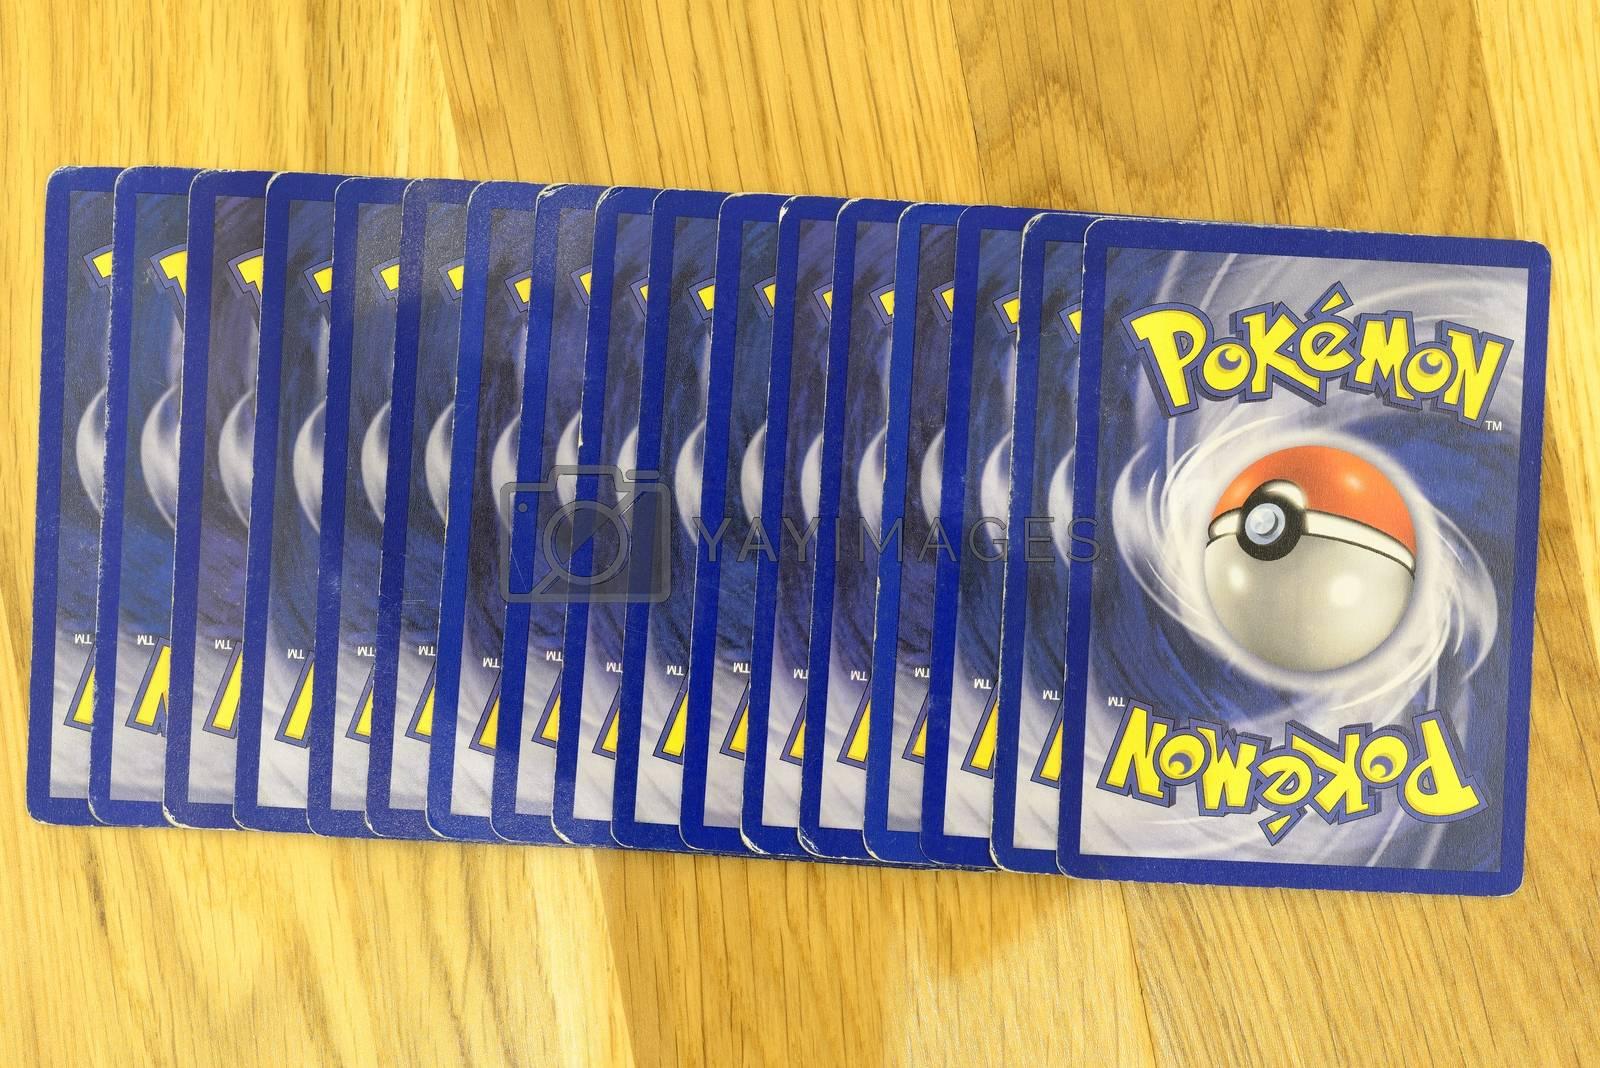 Pokemon trading cards background